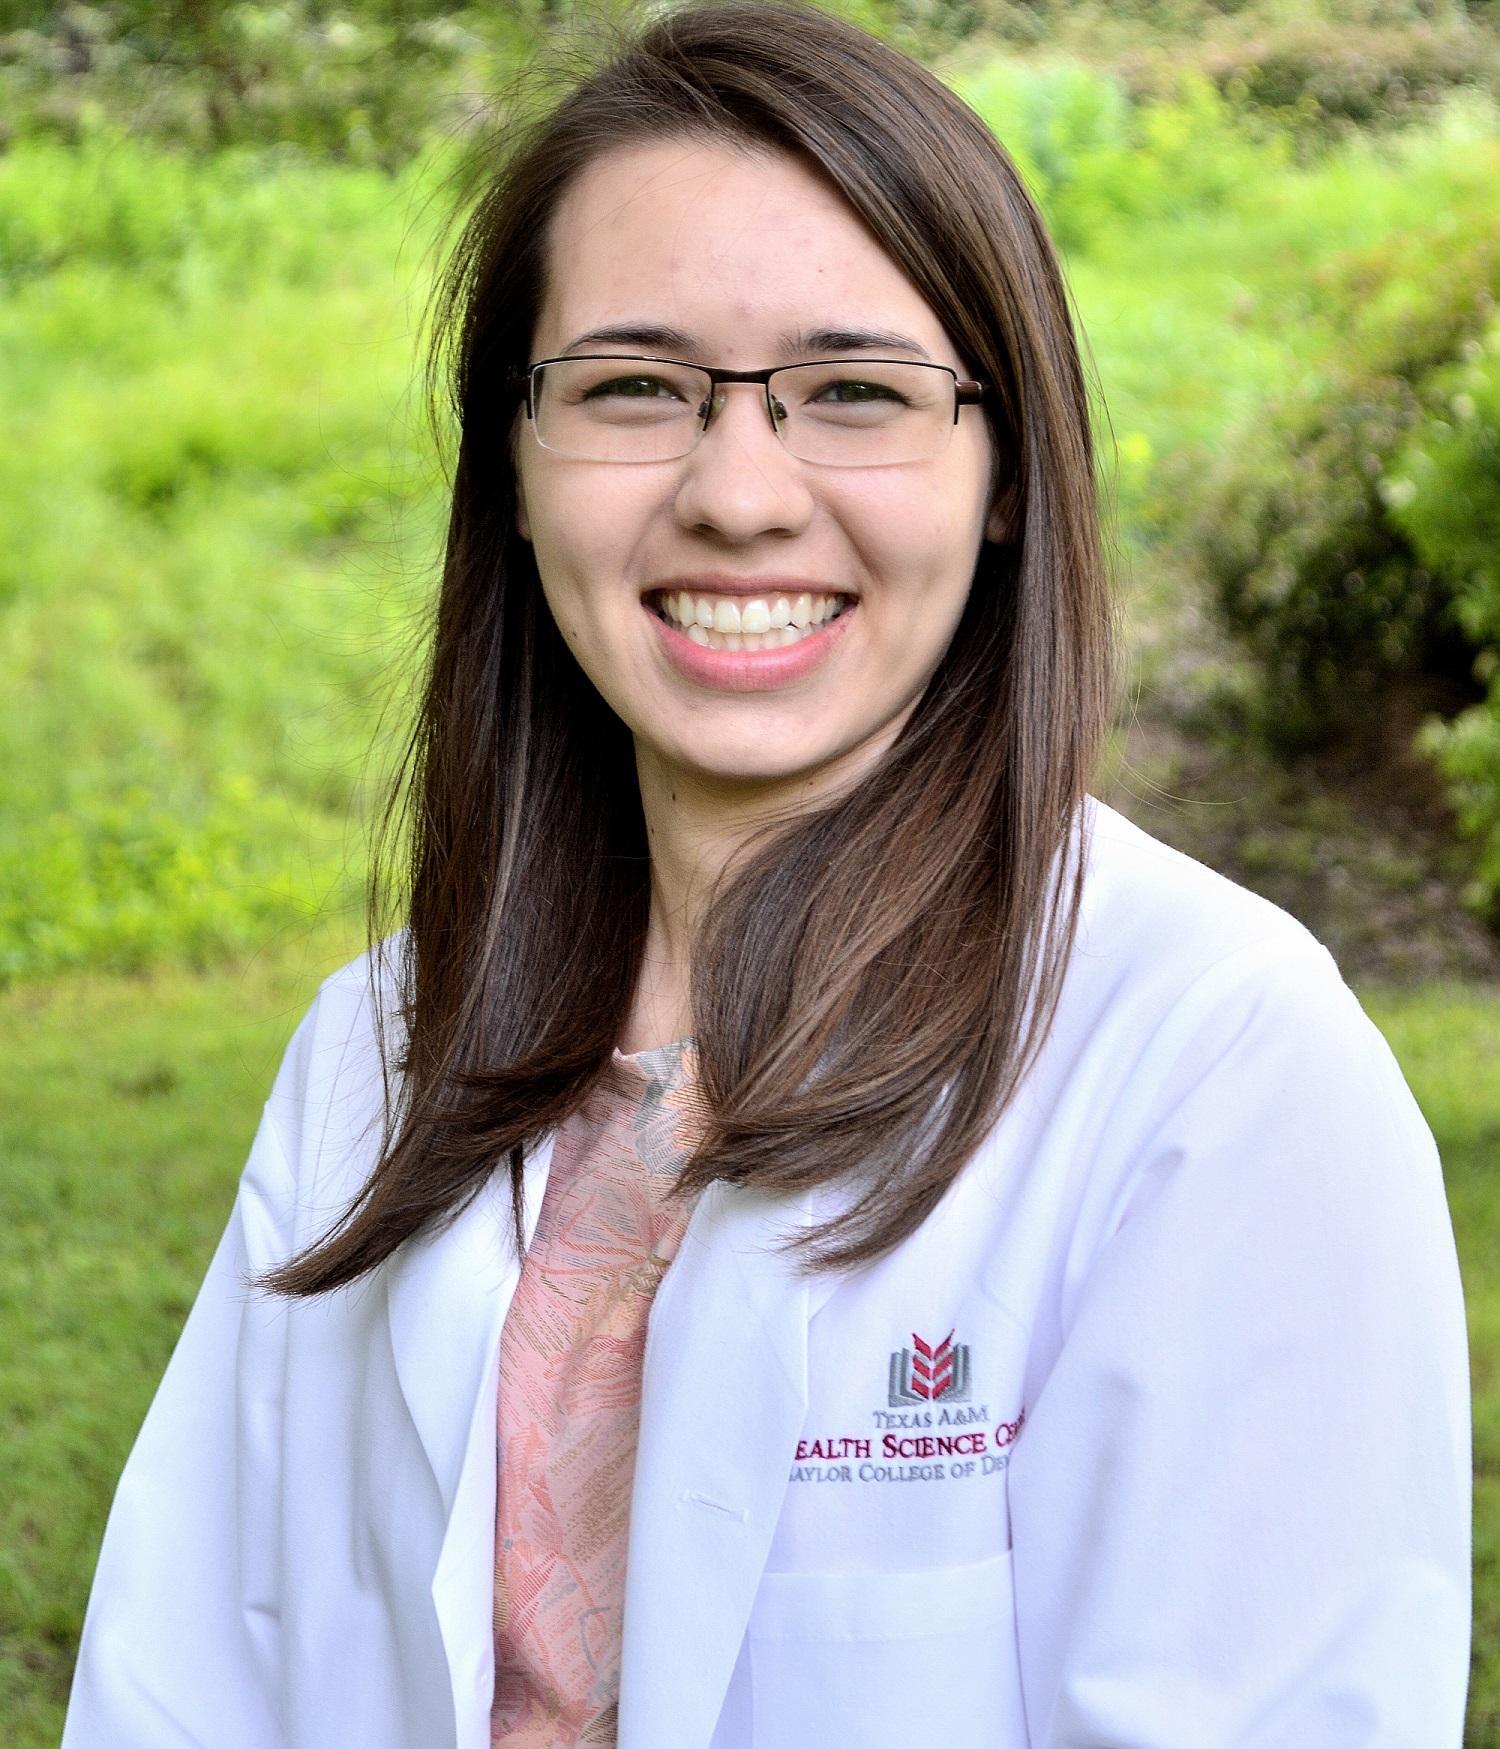 Profile Photo of Dr. Sarah Wojciechowski - None